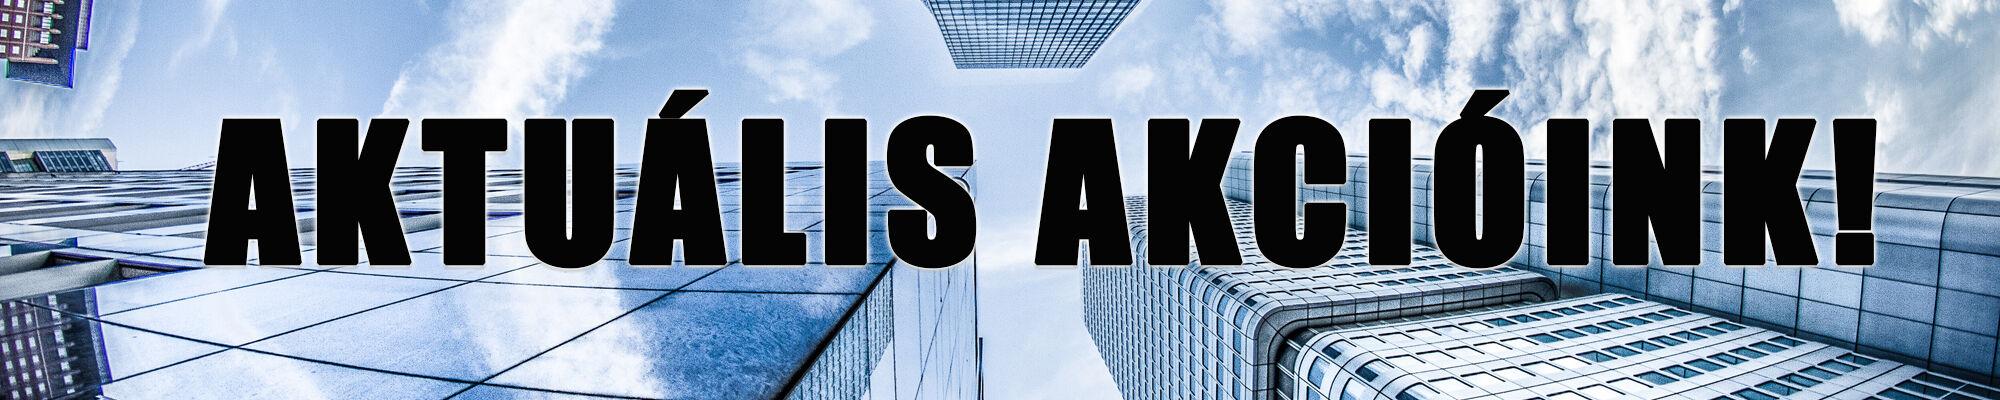 aktualis-akcioink